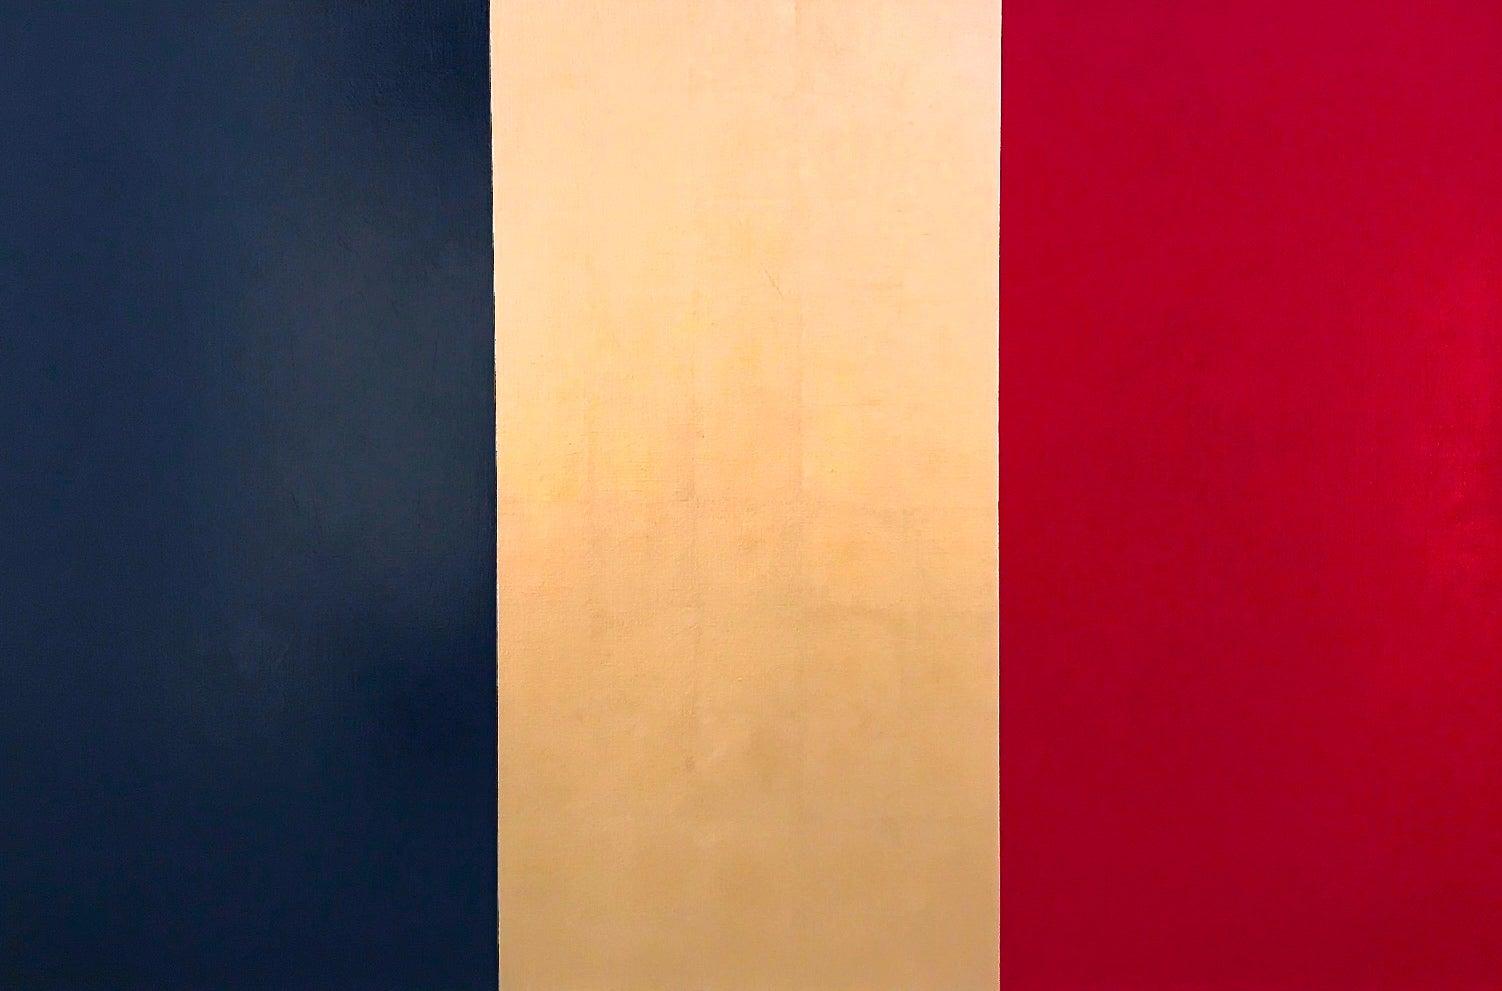 """Viva la France!"" Contemporary Pop Art Modern Flag Minimal 23k Gold Oil Painting"